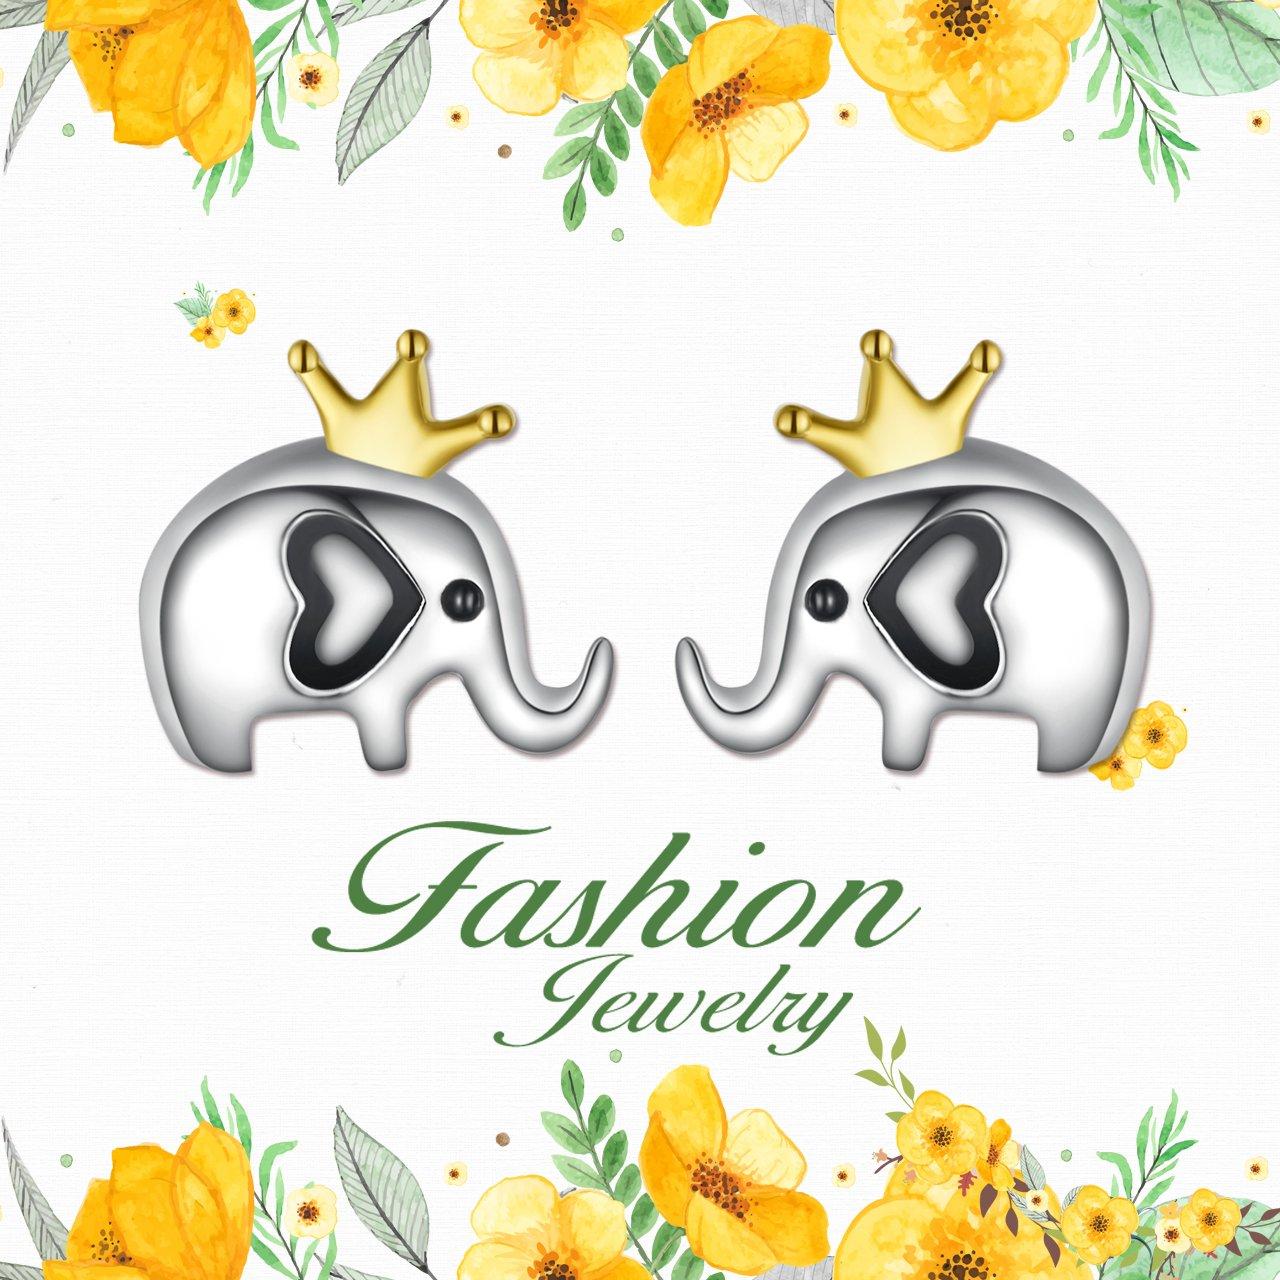 925 Sterling Silver Lucky Elephant Stud Earrings For Women Girls